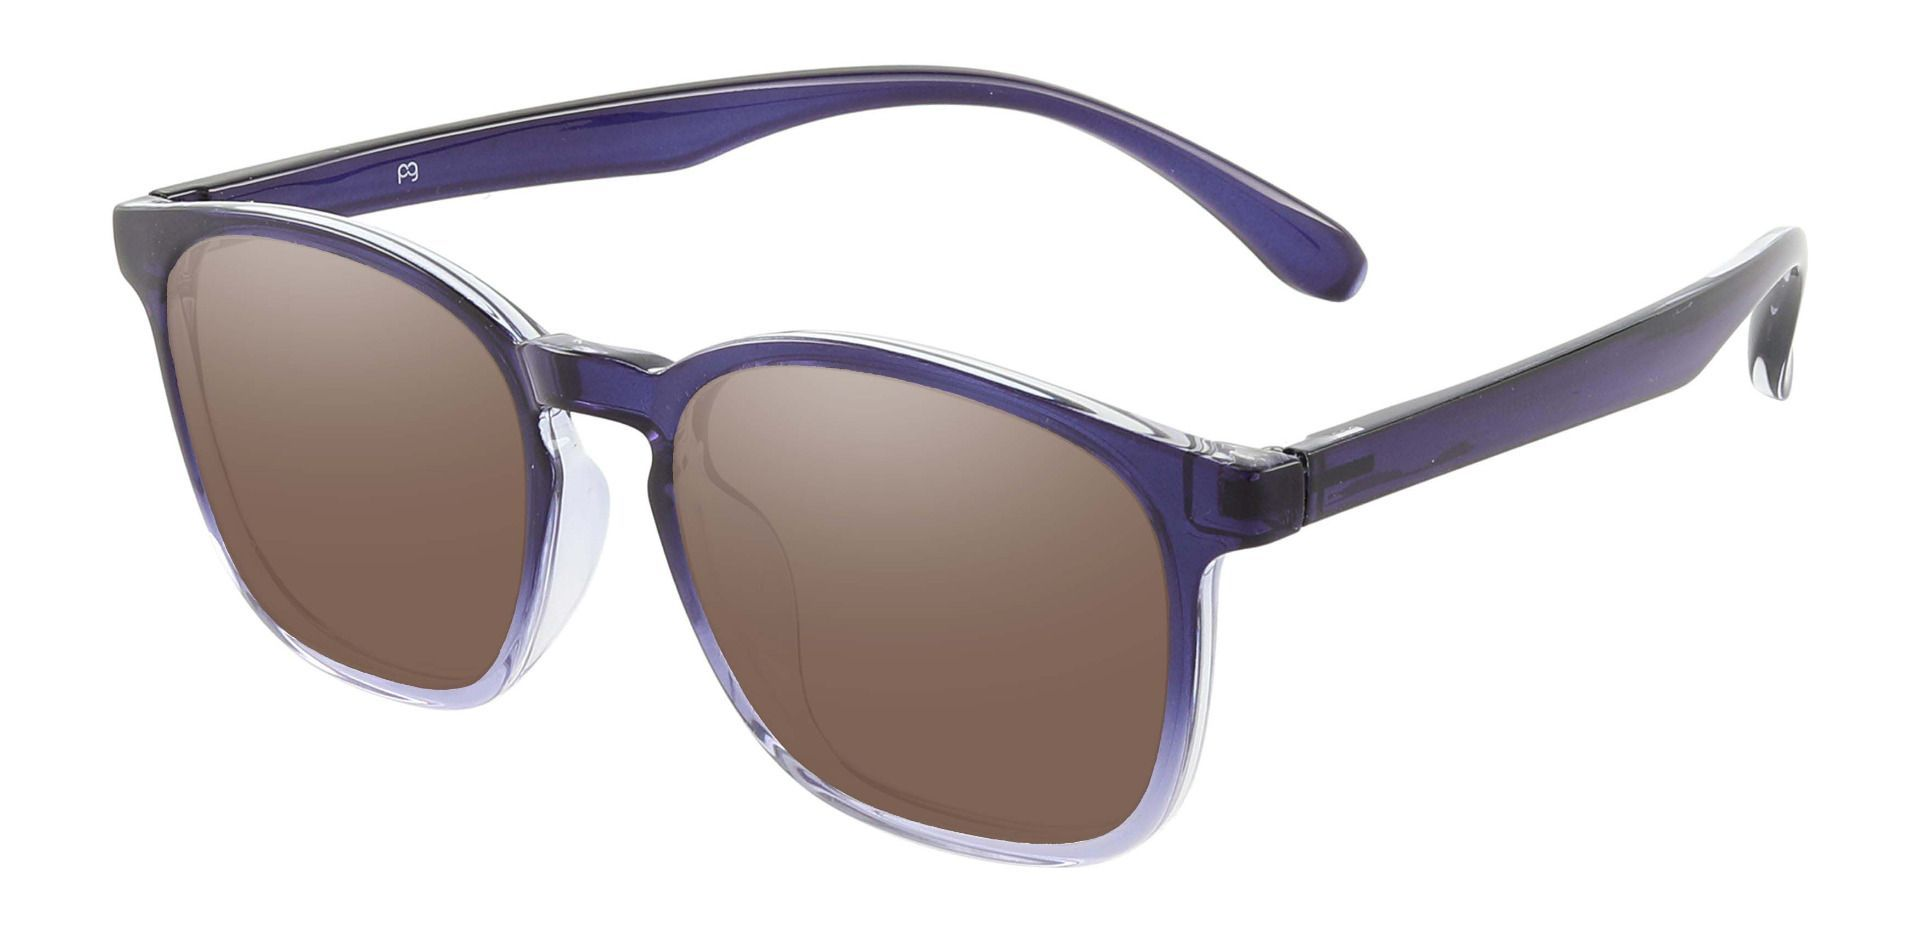 Gateway Square Prescription Sunglasses - Blue Frame With Brown Lenses